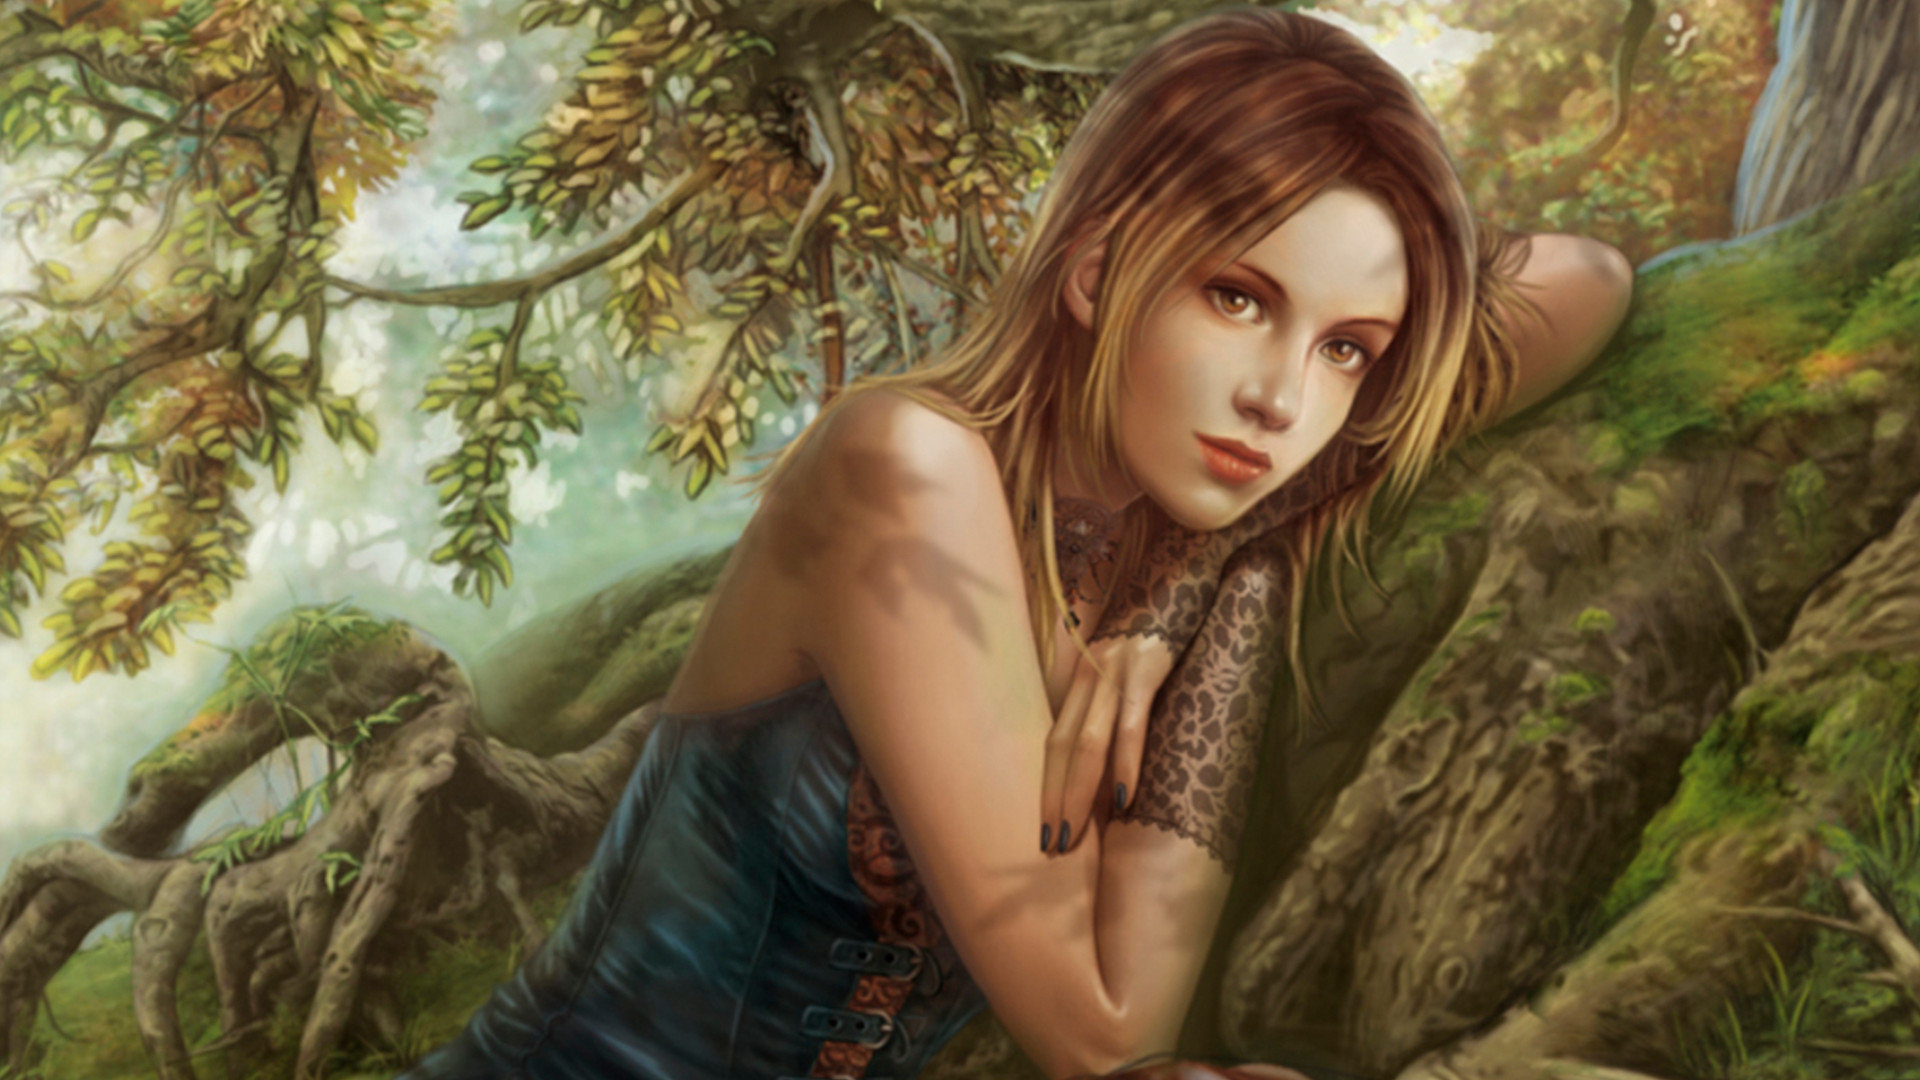 Free Fantasy Girl High Quality Wallpaper Id 335489 For Full